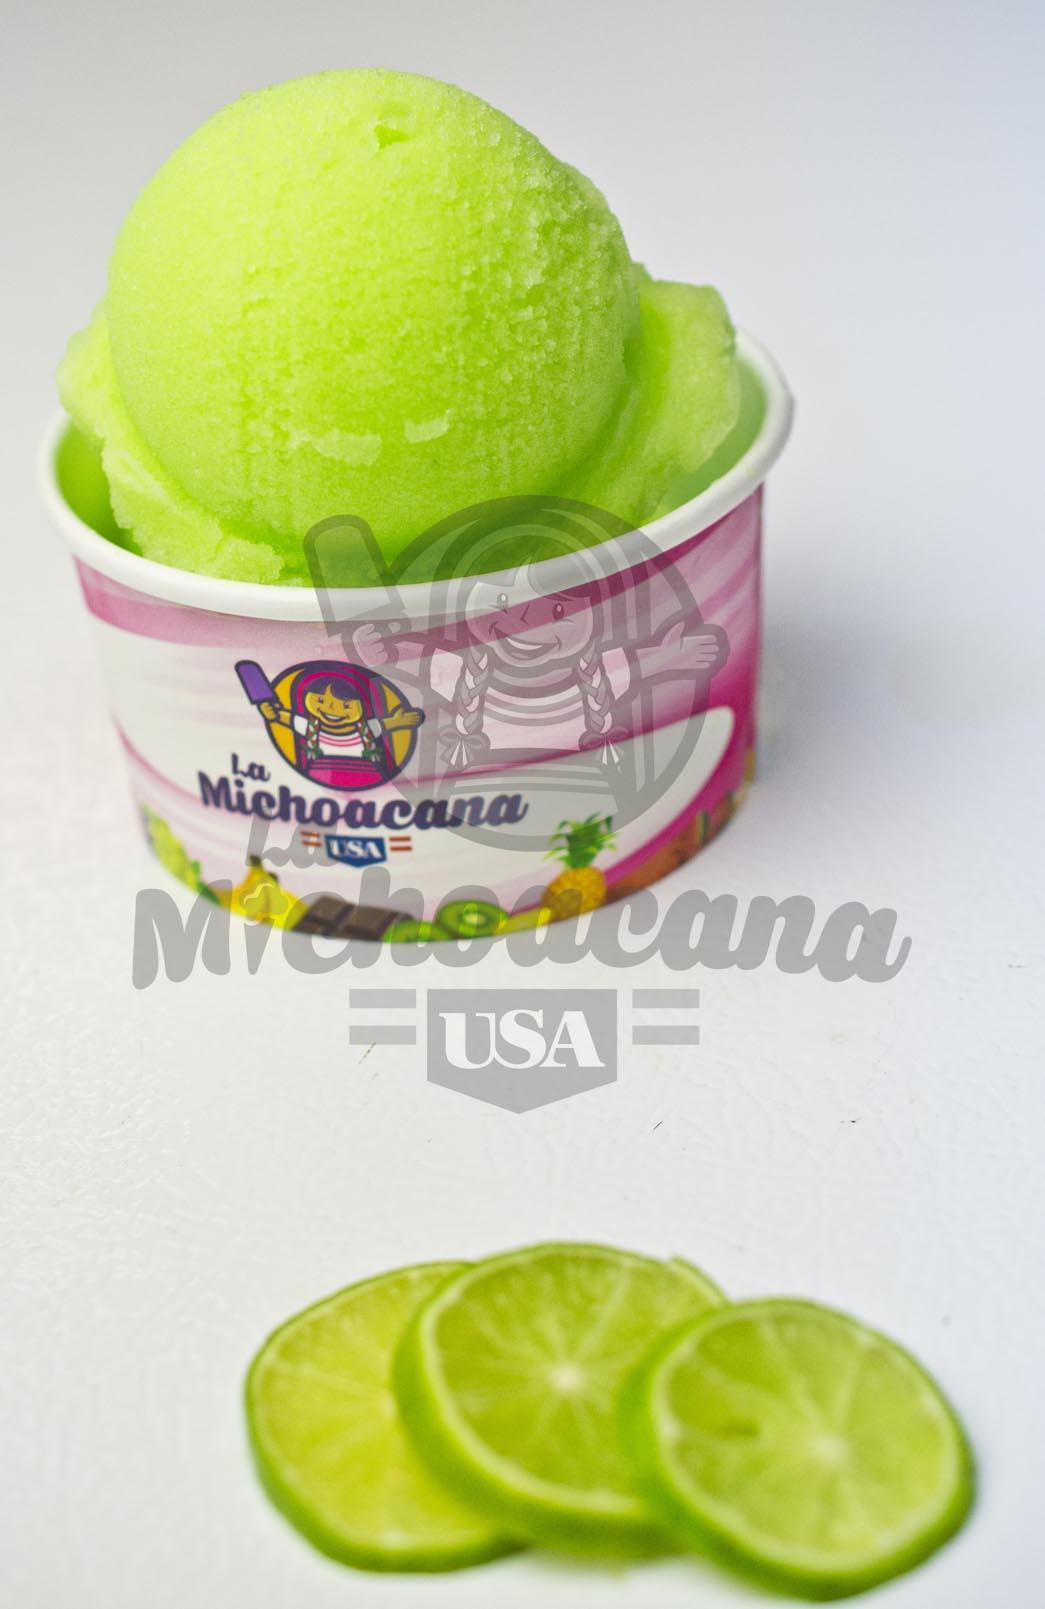 La Michoacana Usa